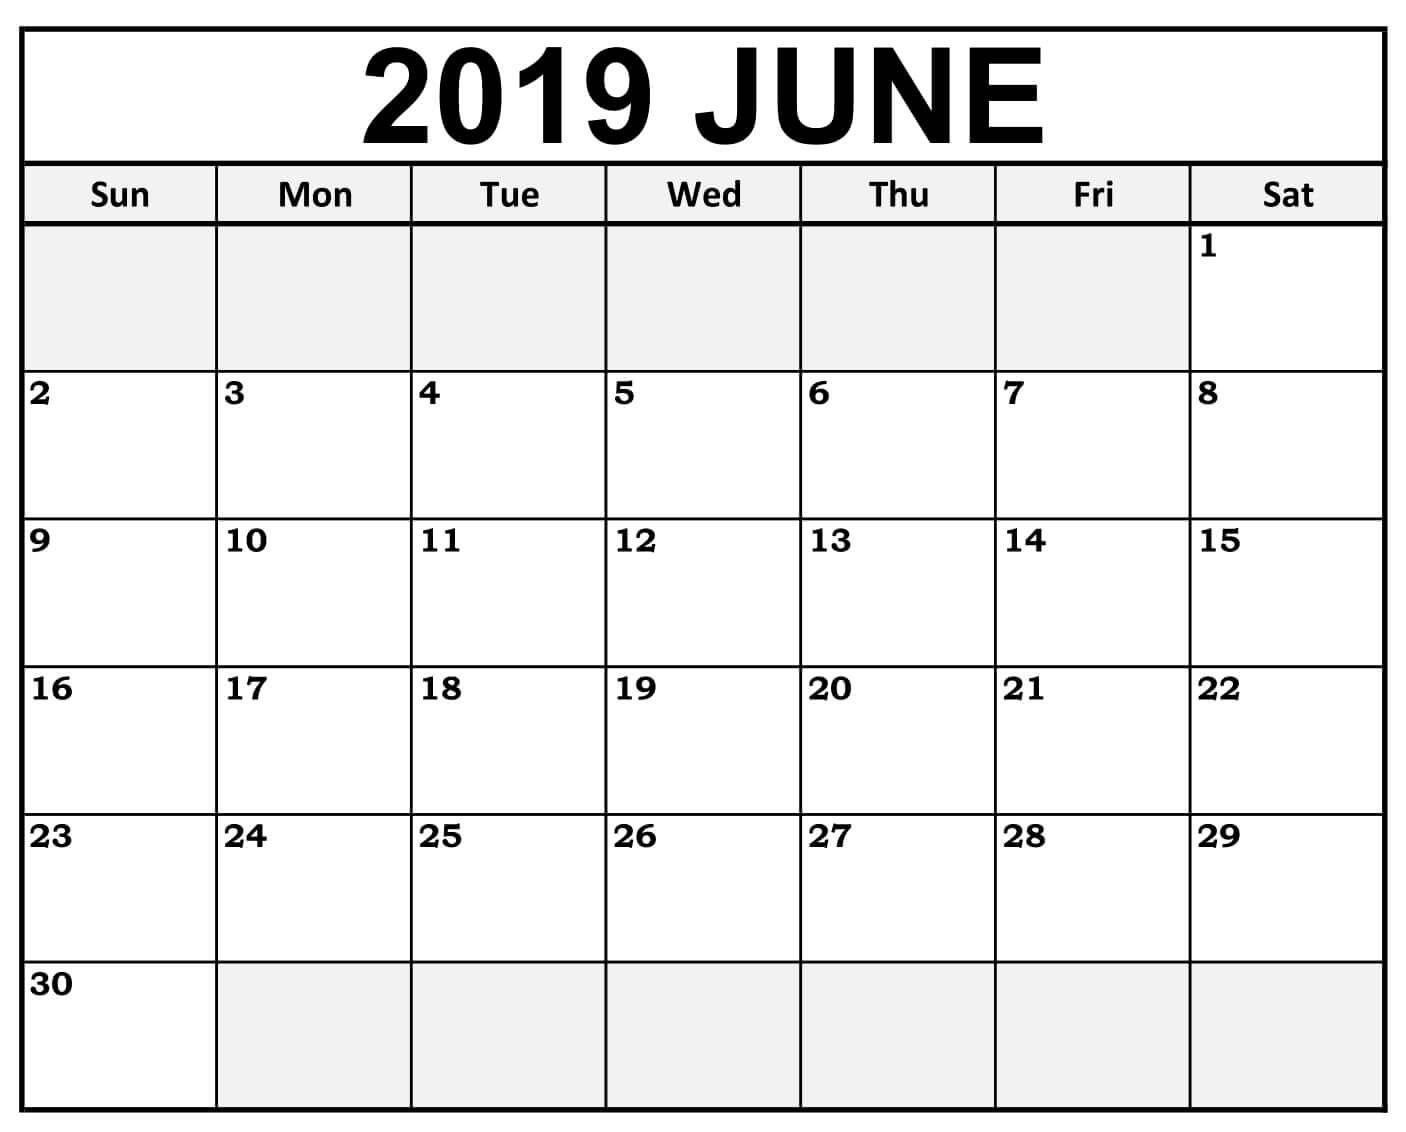 June 2019 Calendar #weekend #highlighted In 2019 | September